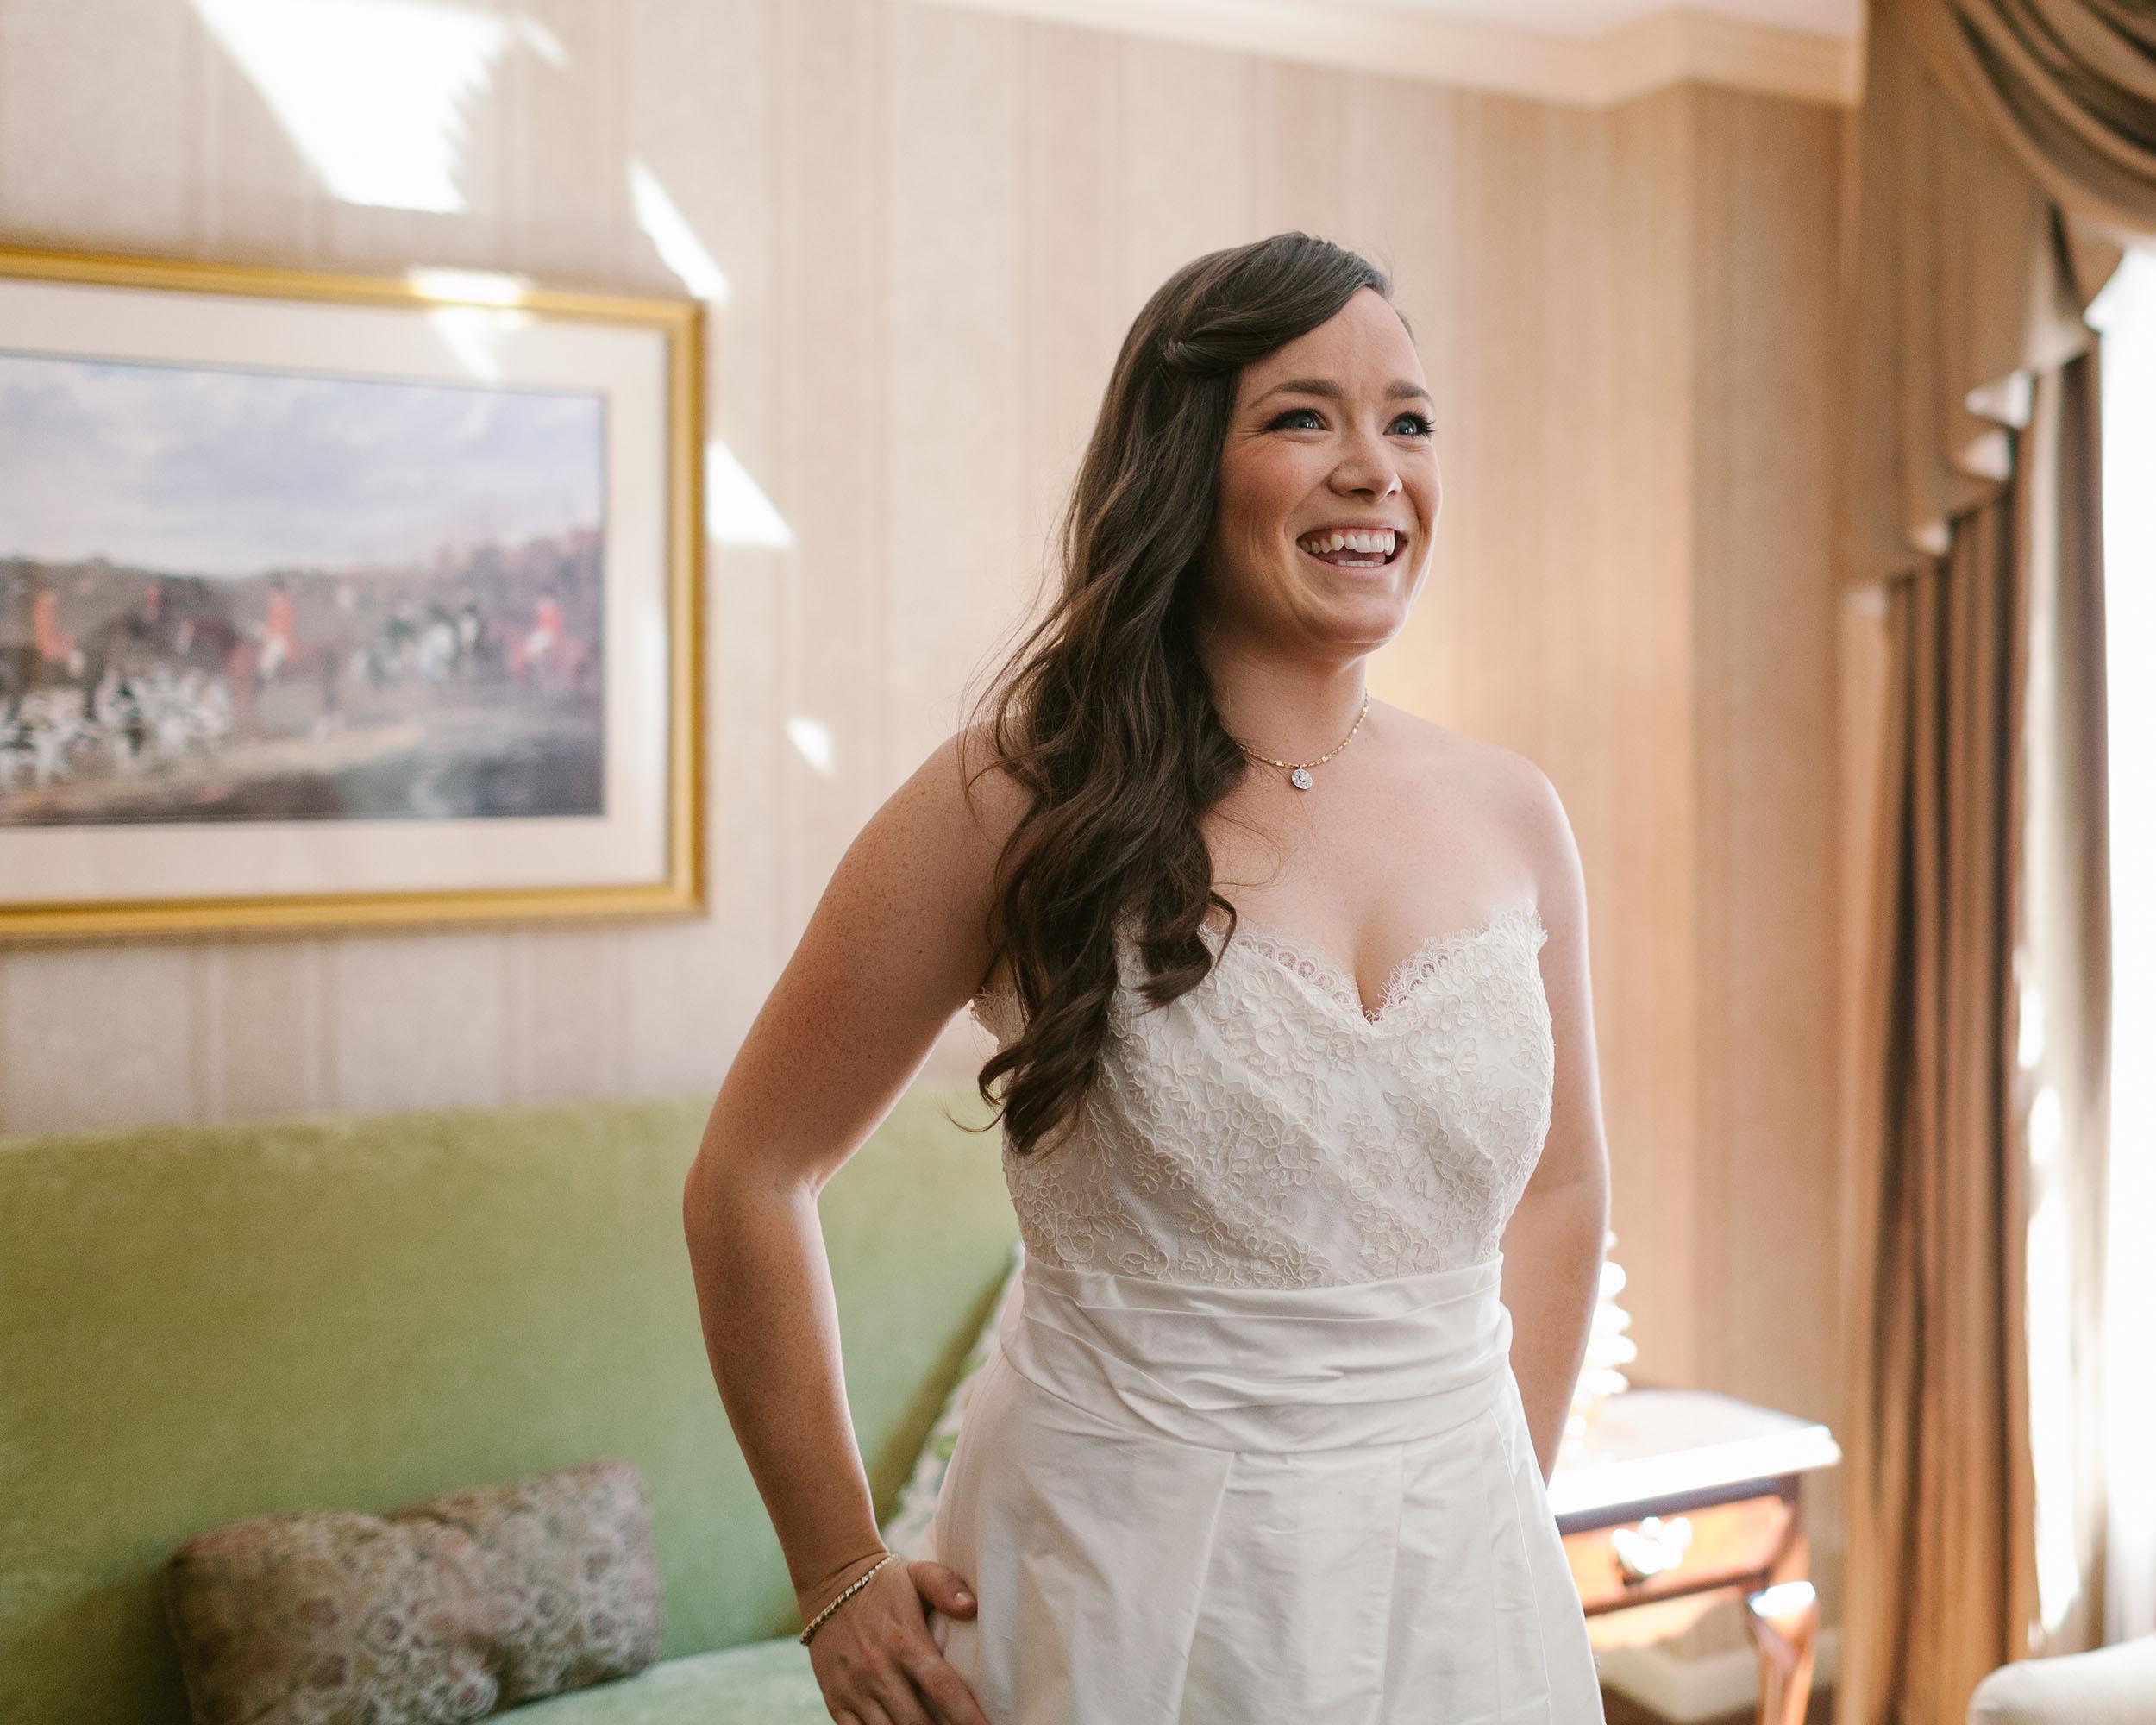 KarliCadel-Wedding-LaurenJake-139.jpg